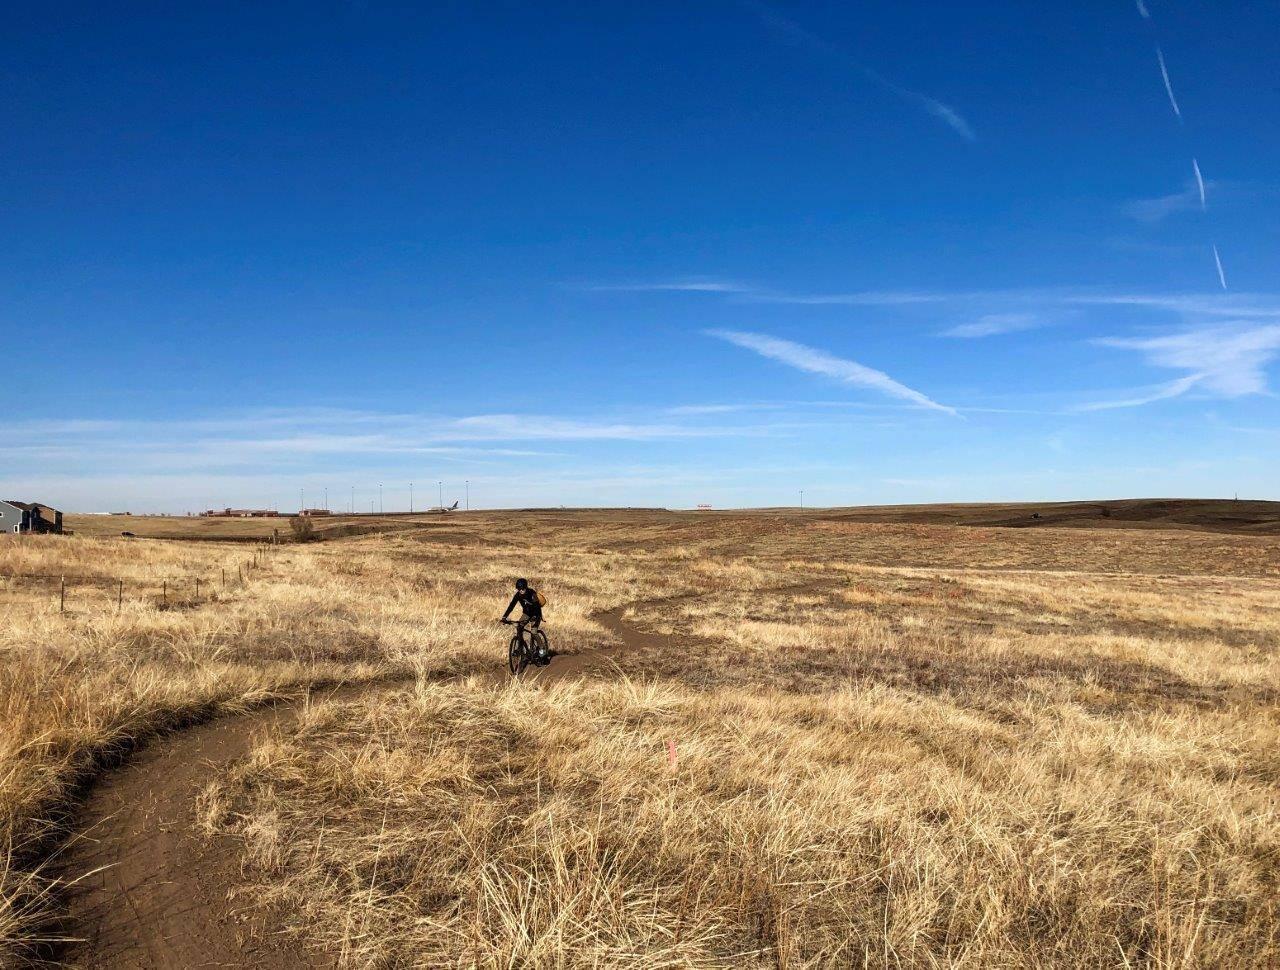 Image of a biker at the Bluestem Prairie Open Space in Colorado Springs, Colorado